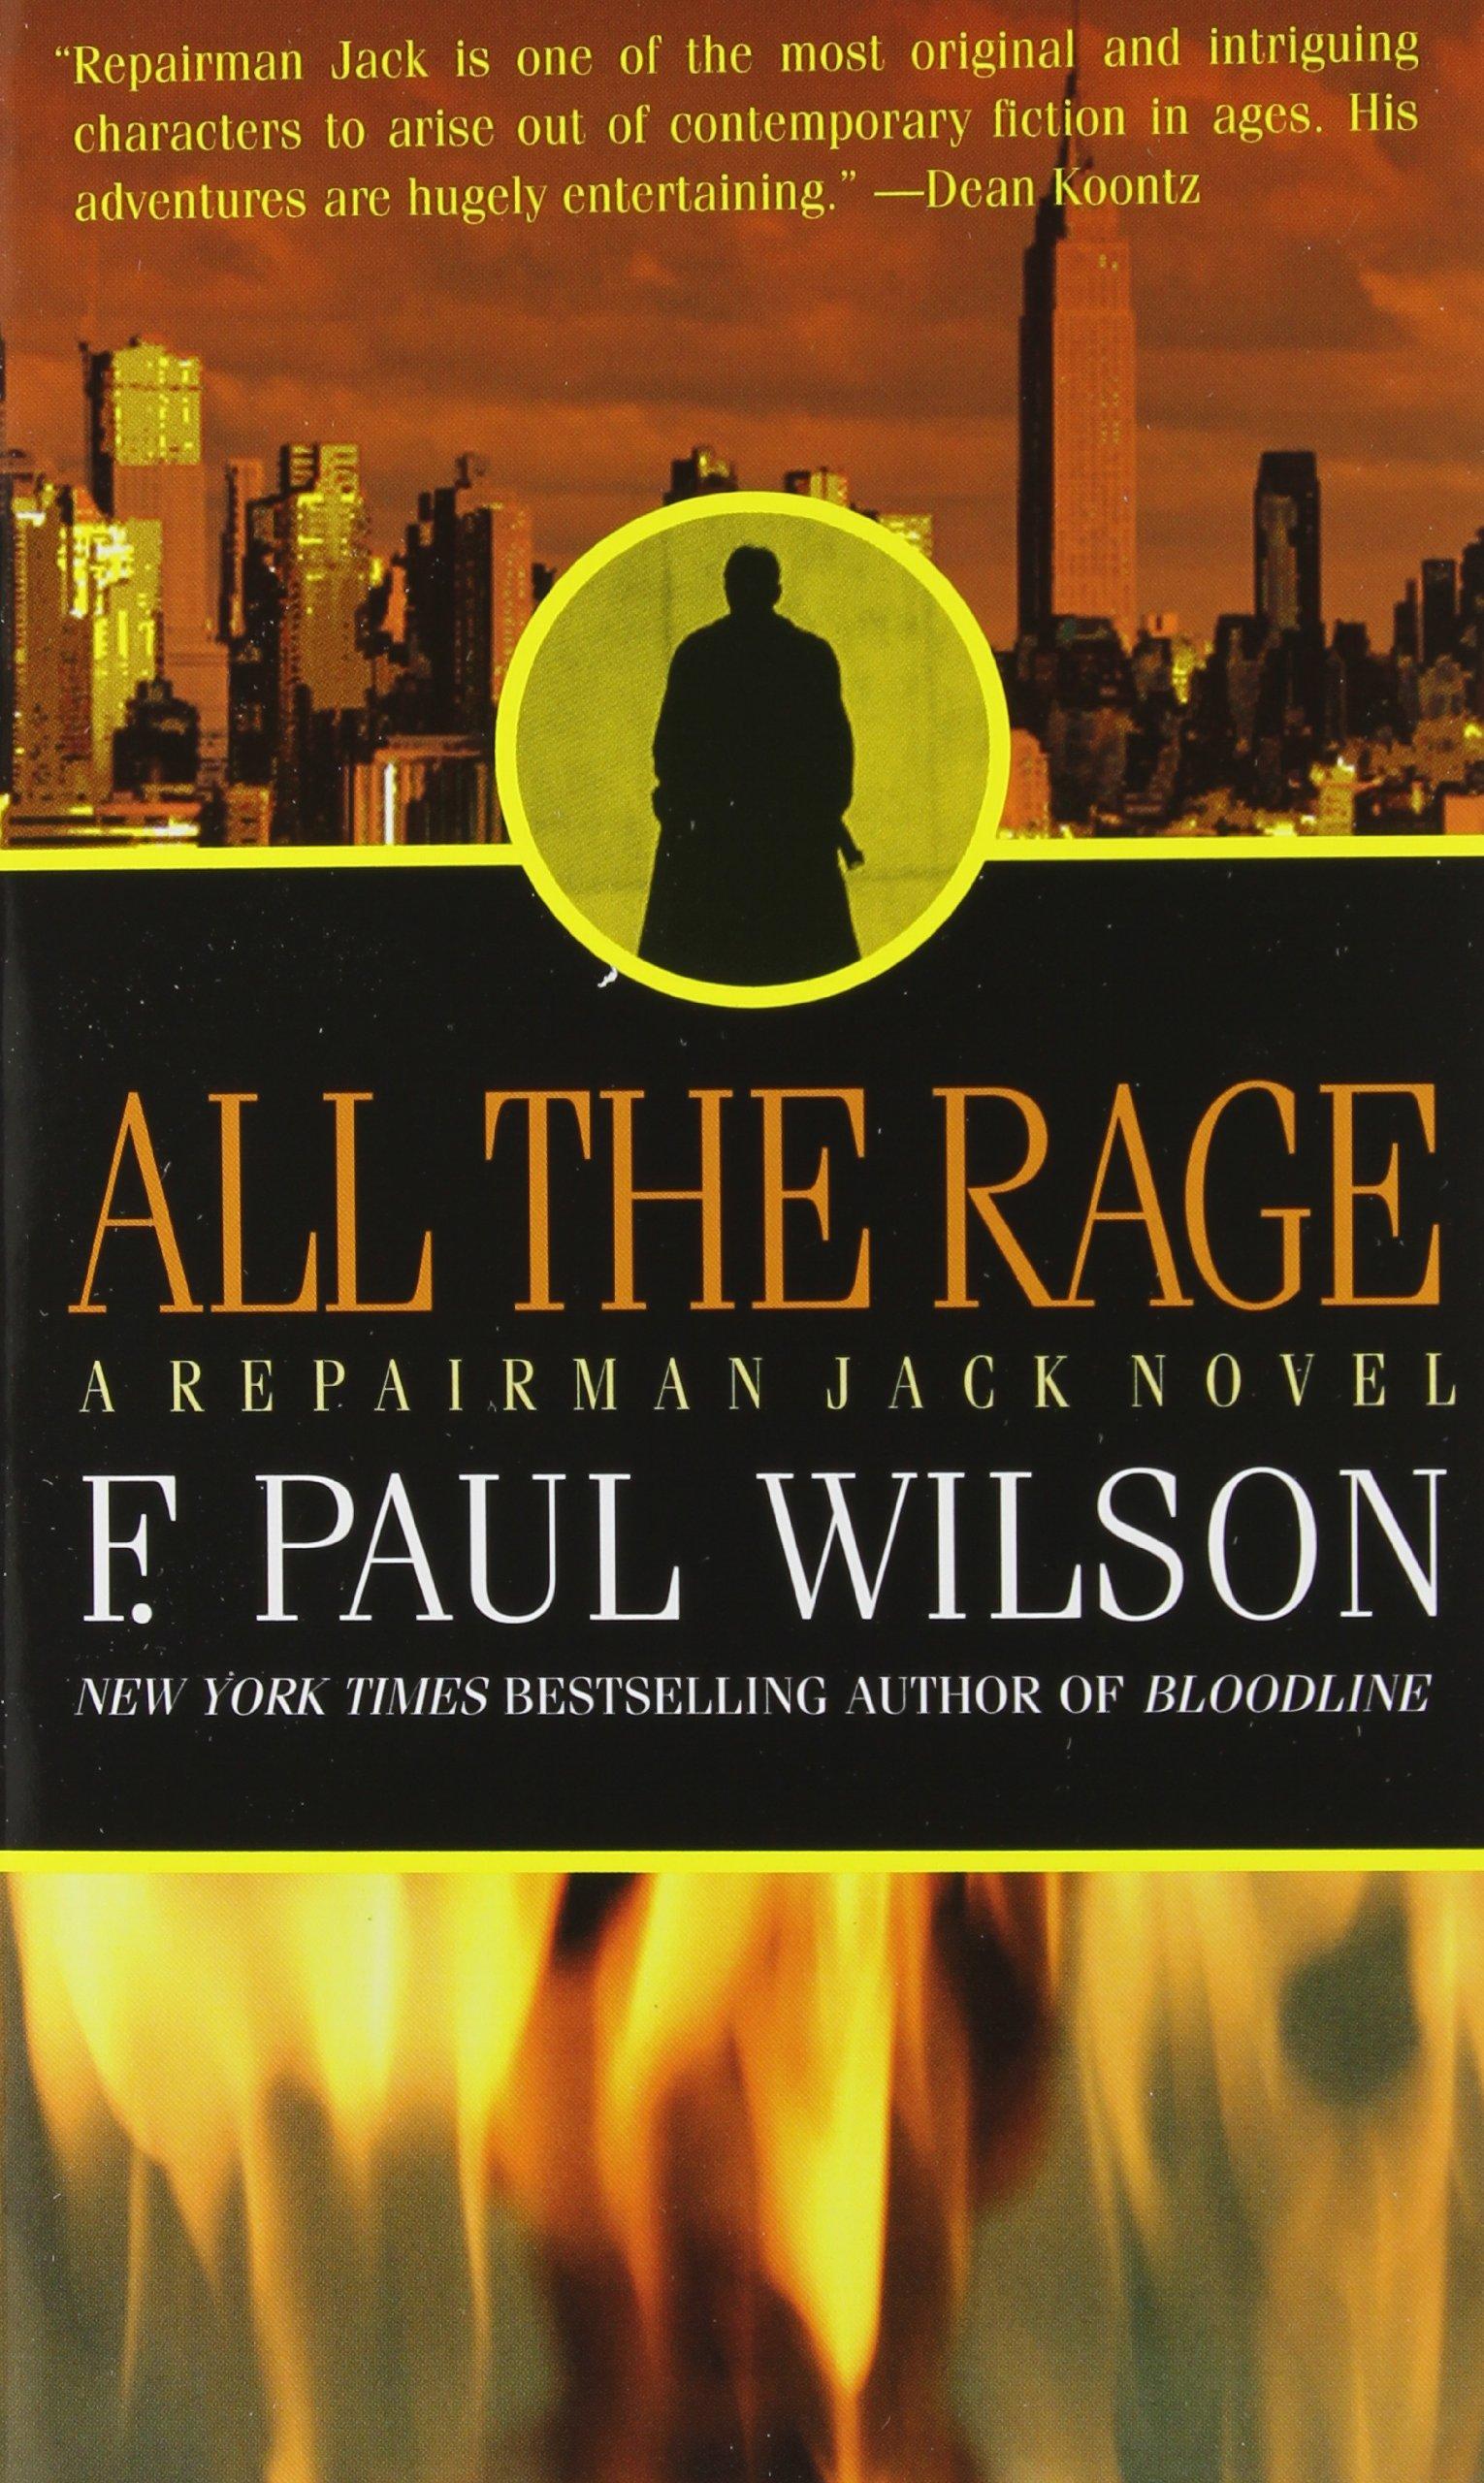 F PAUL WILSON EBOOK